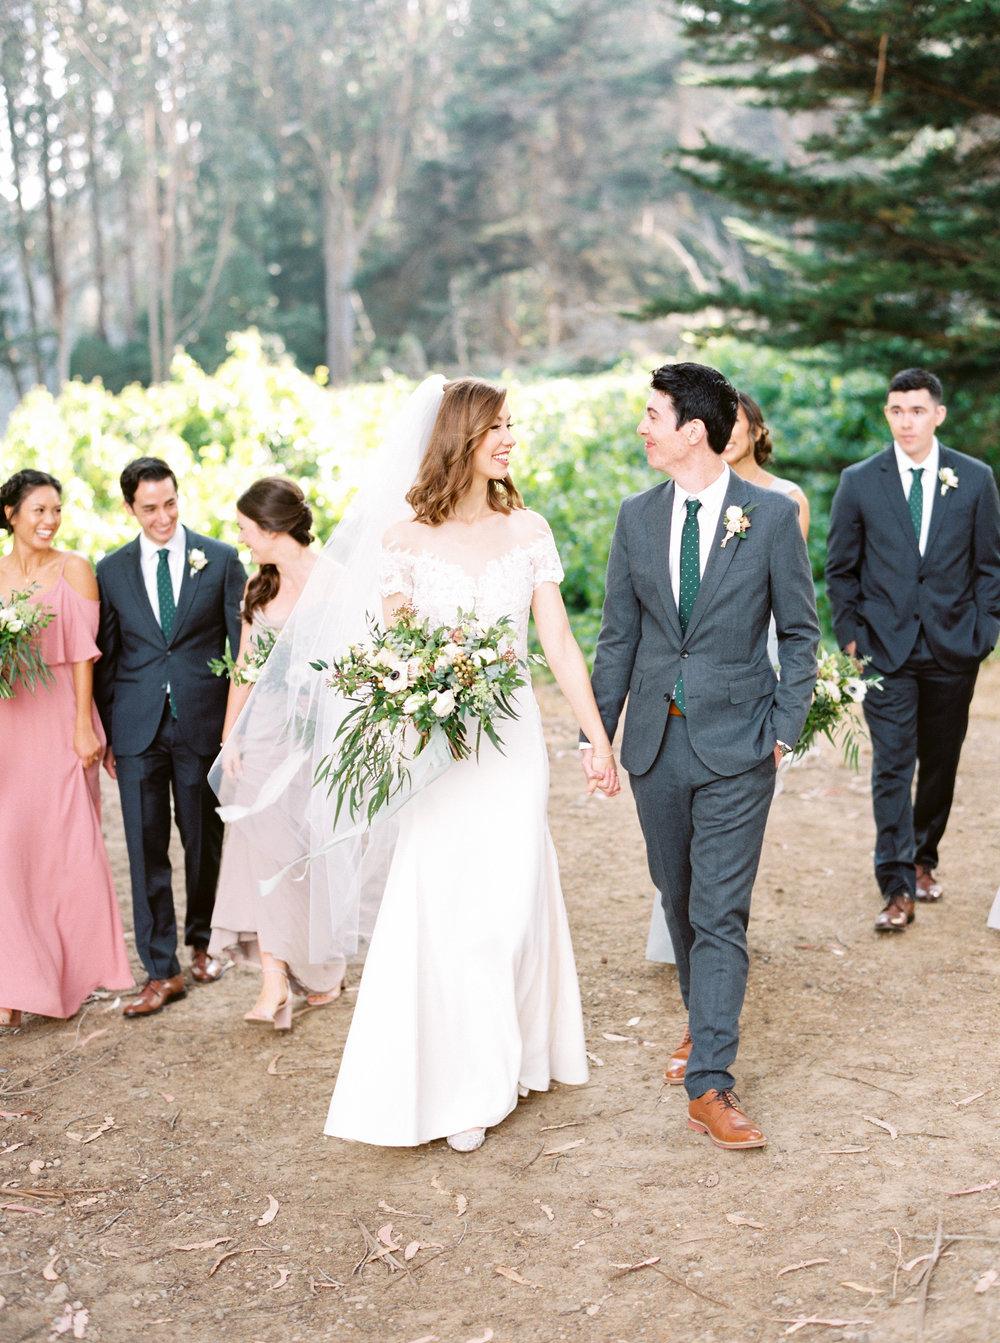 Log-cabin-wedding-in-presidio-san-francisco-california-desintation-wedding-photography-67.jpg